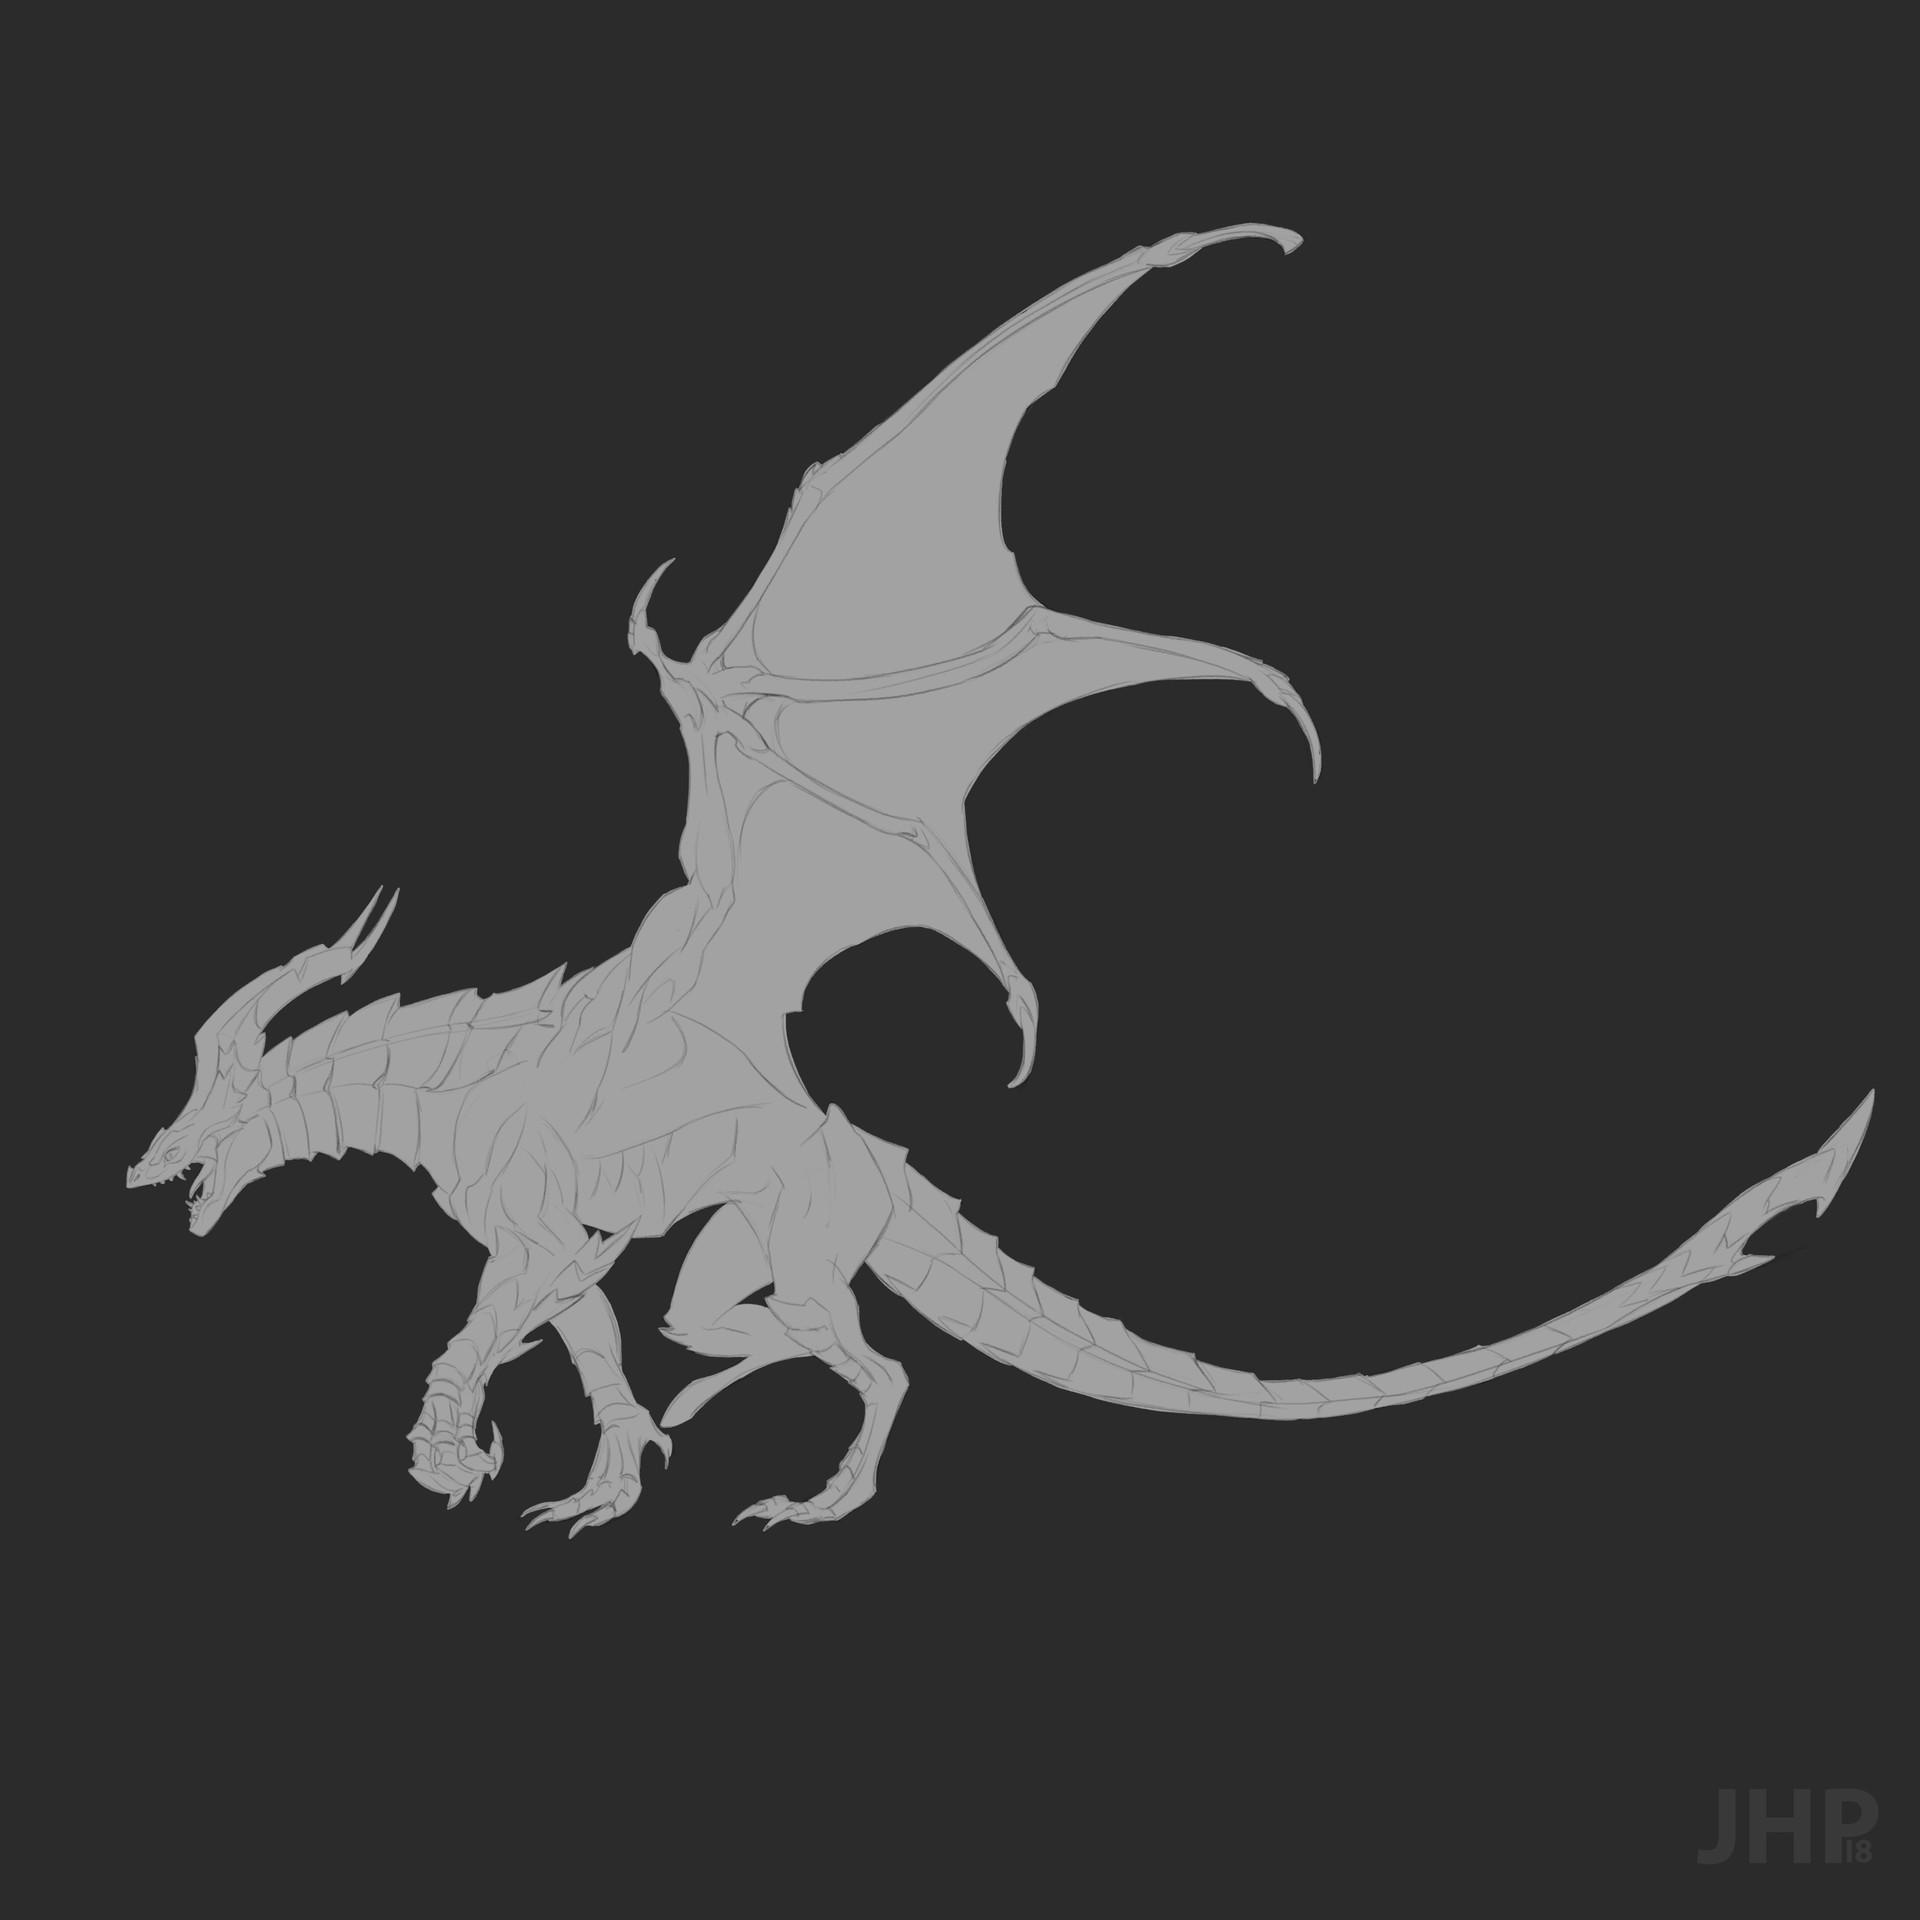 Joao henrique pacheco dragon p 2